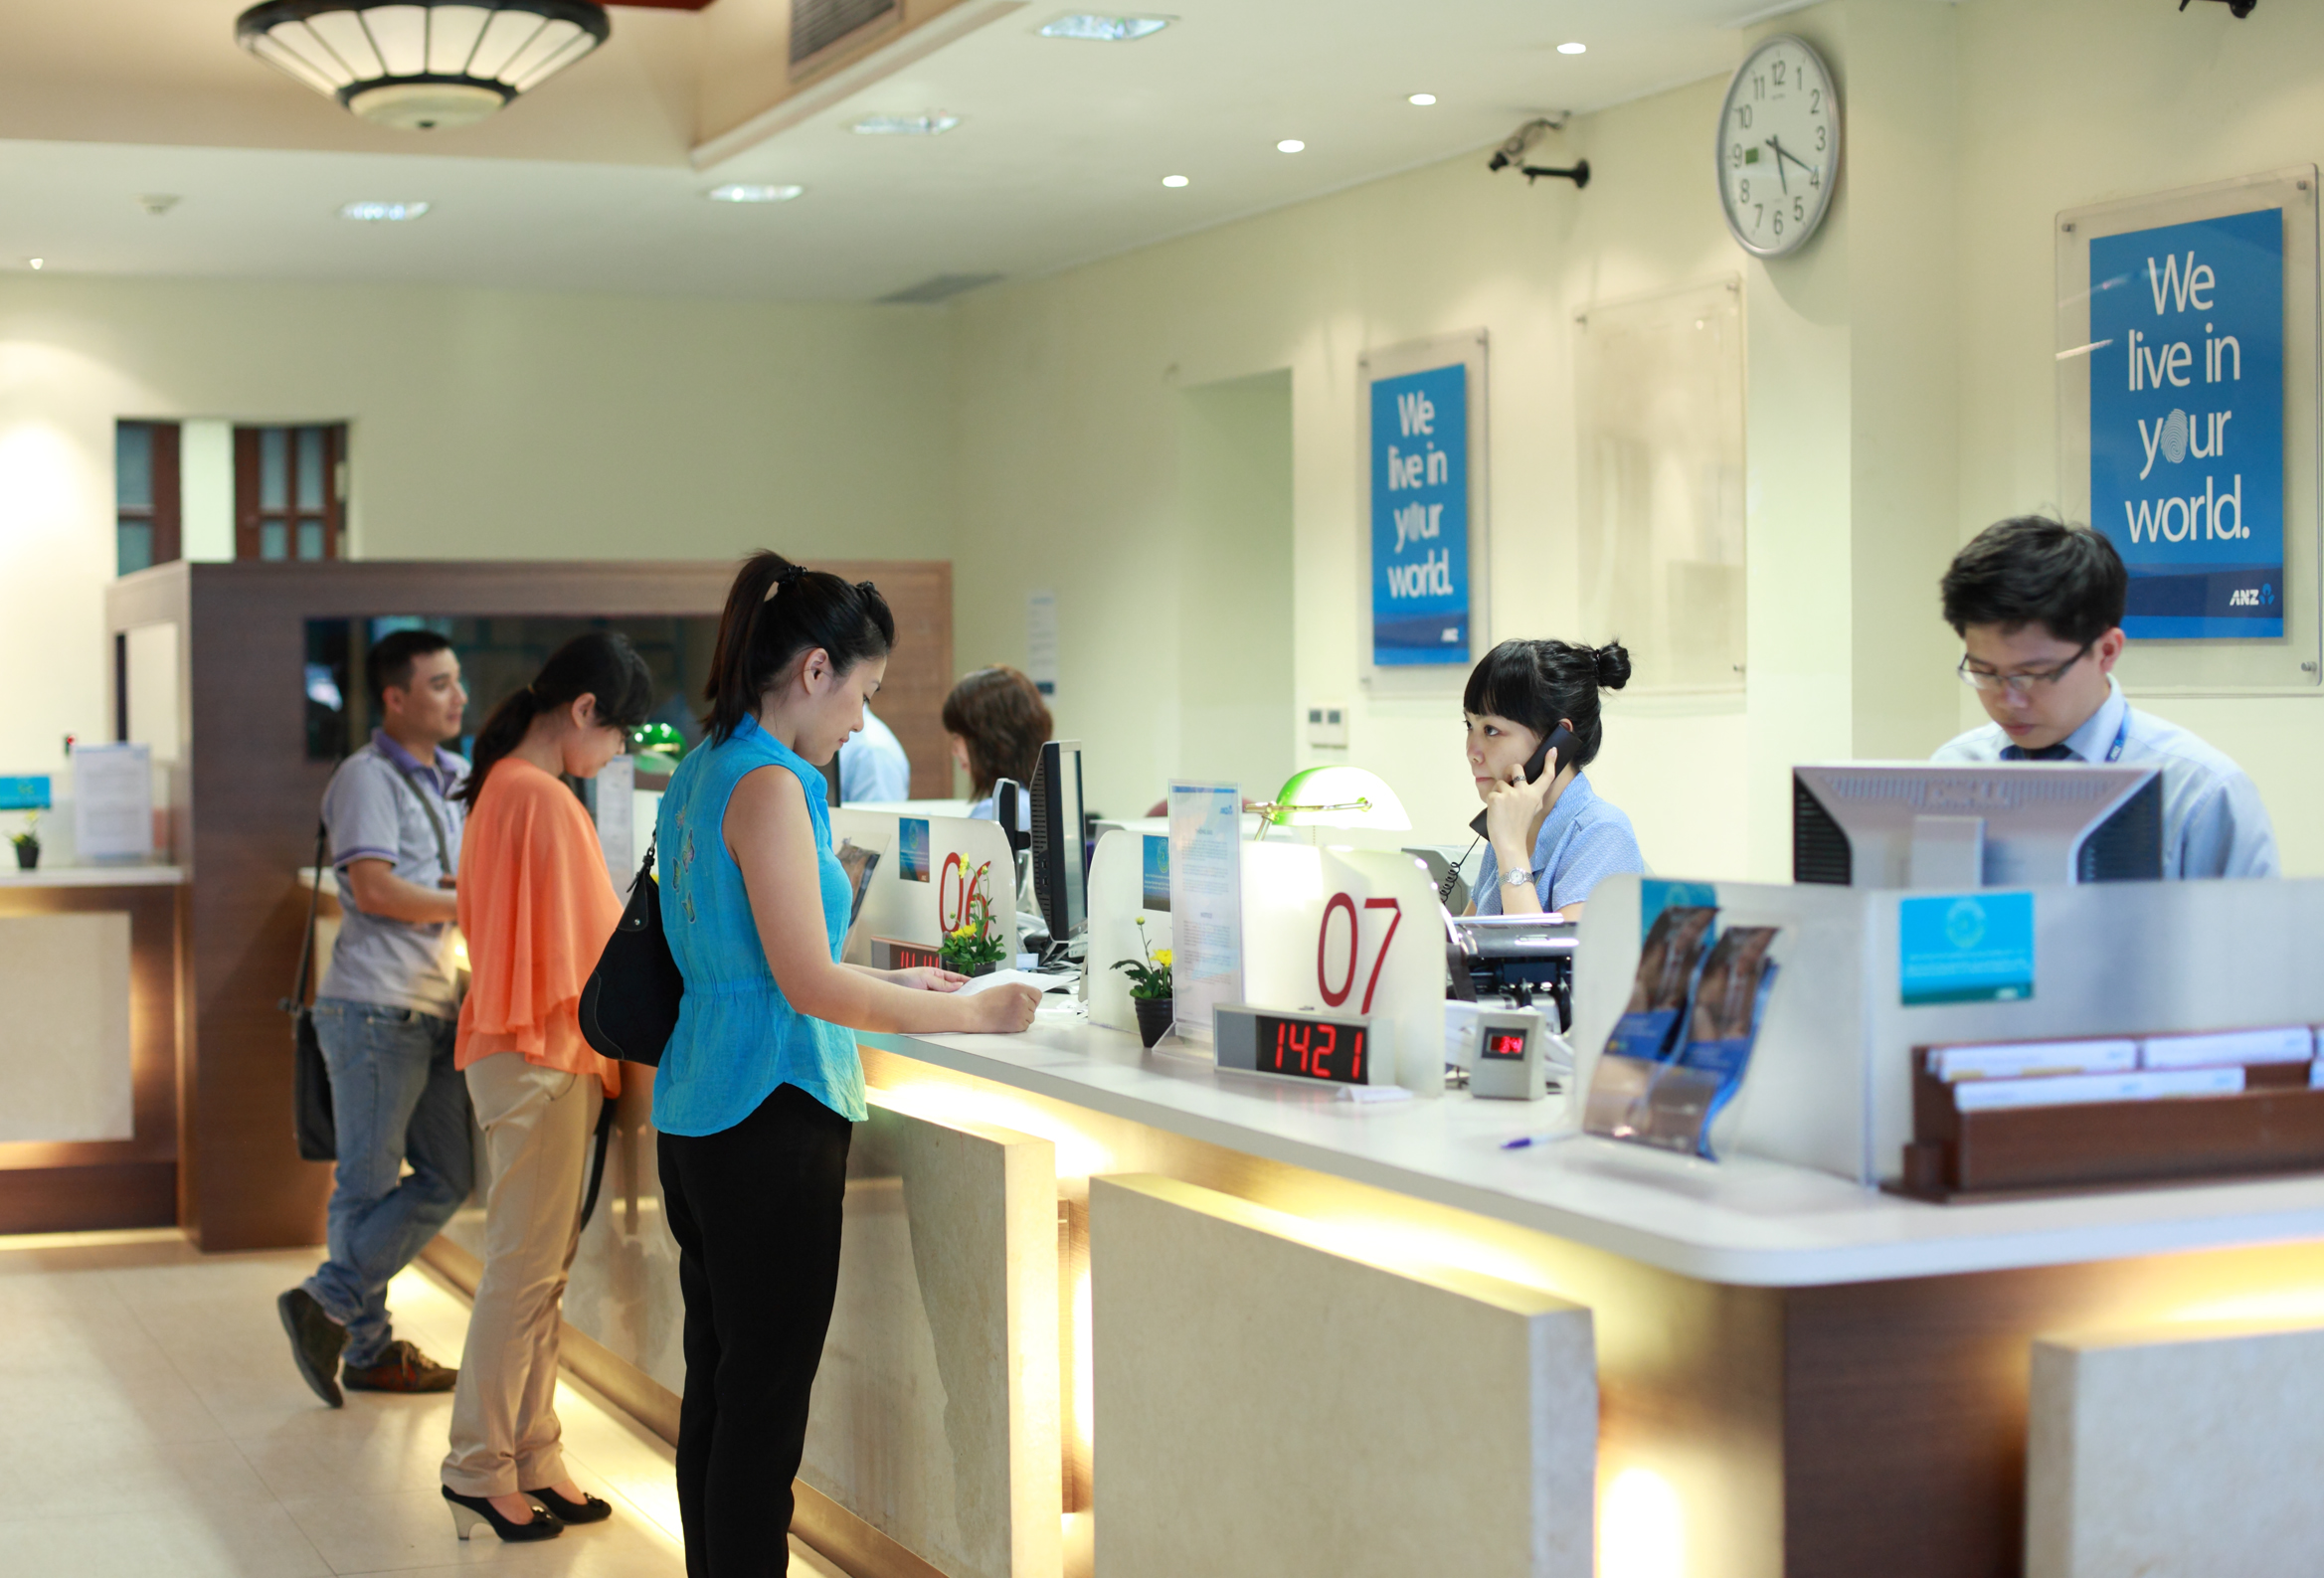 Banking counter in hanoi 1